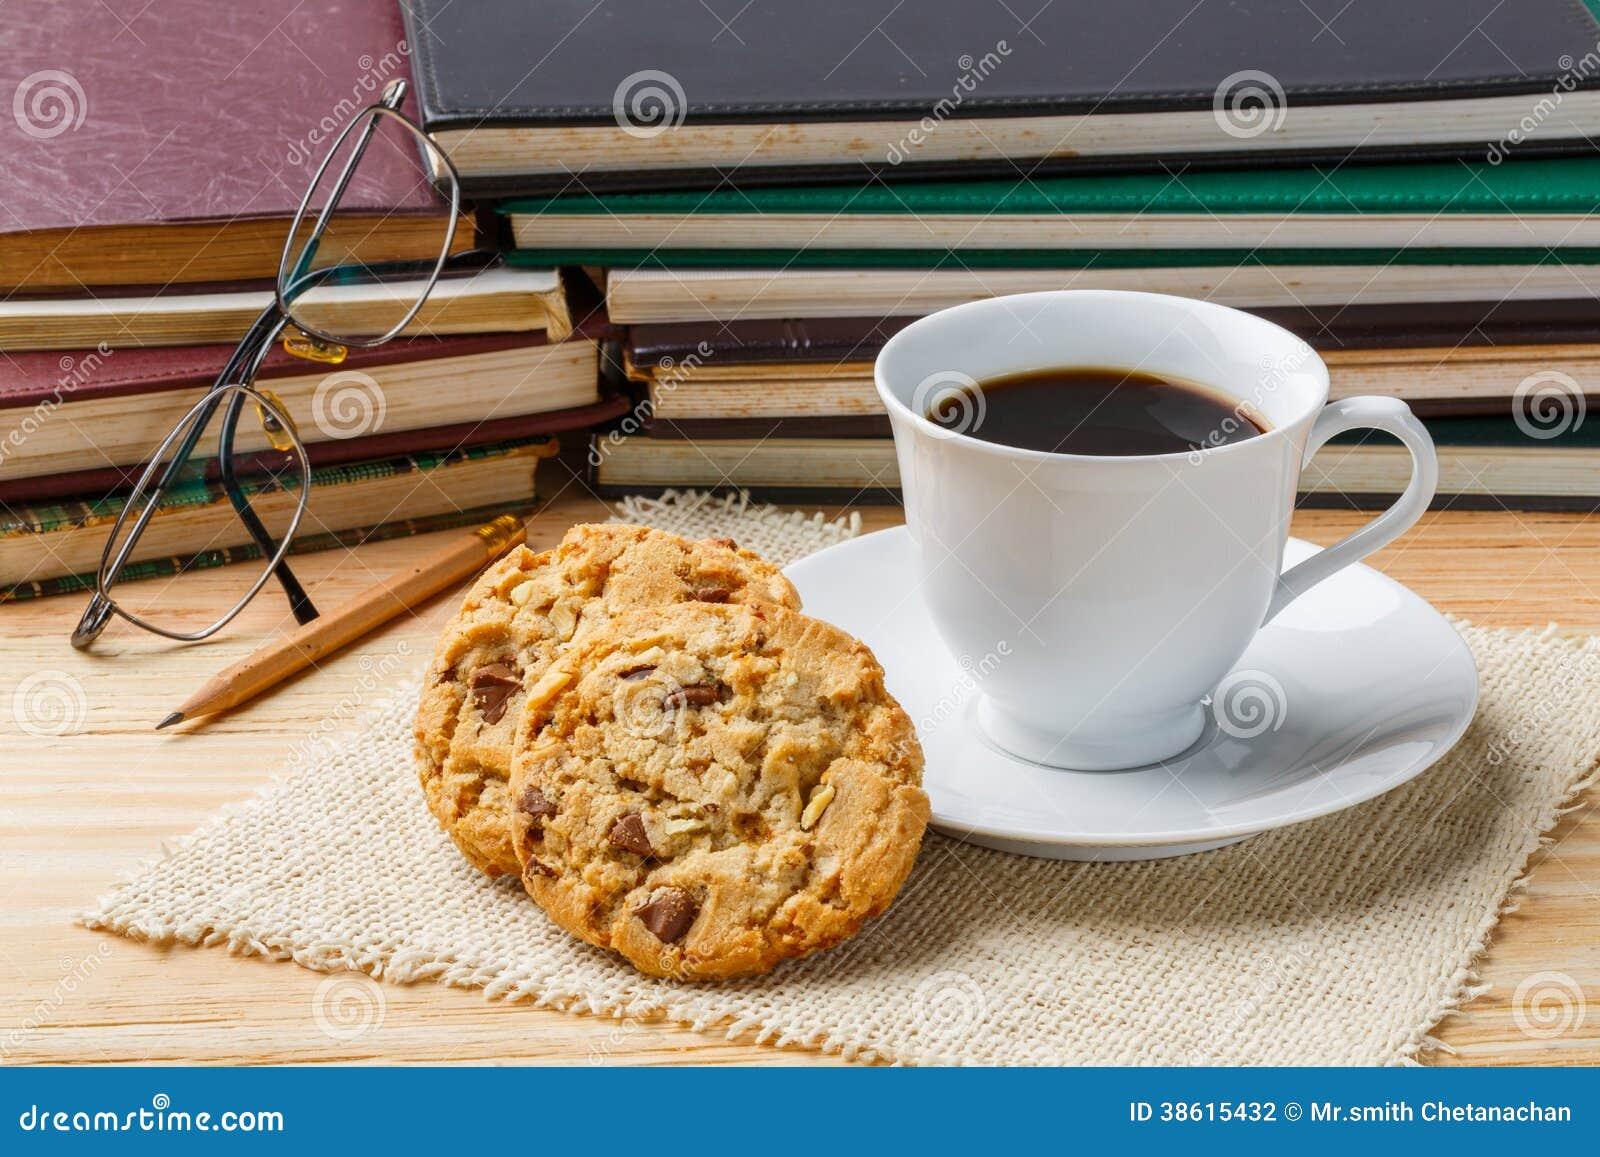 Coffee cookie pencil and eyeglasses